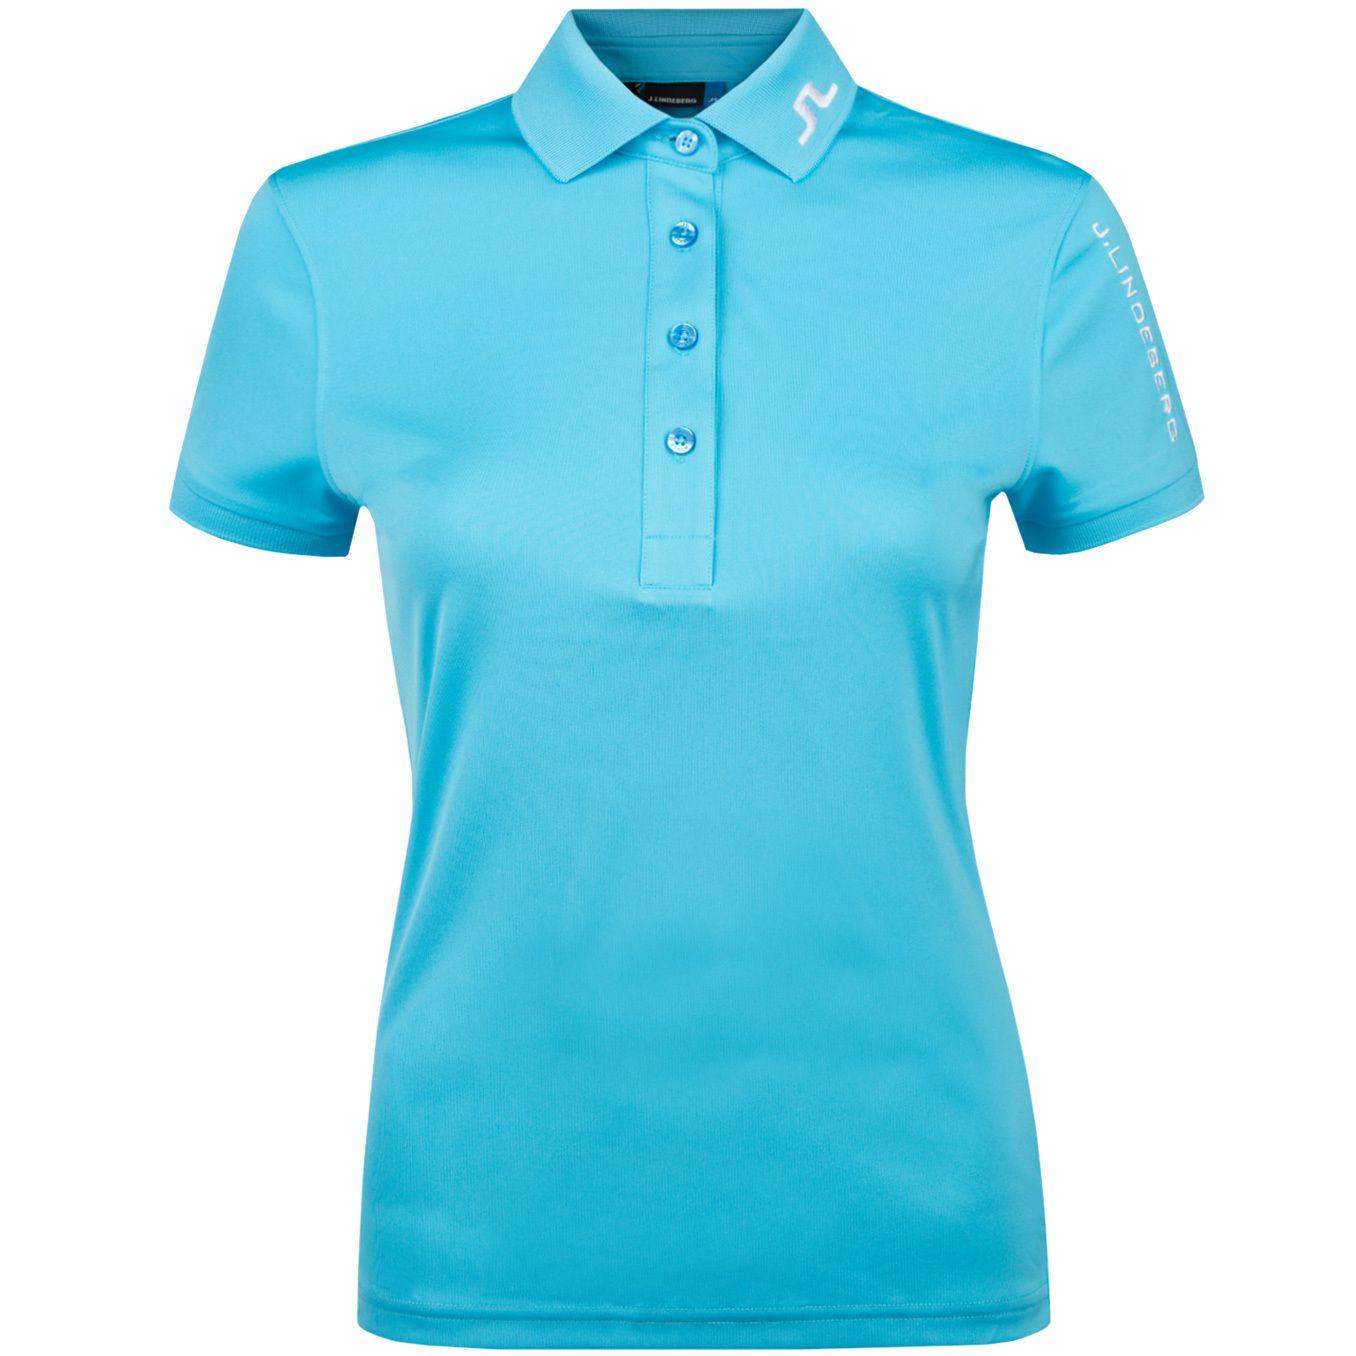 J.Lindeberg Womens Tour Tech Polo Shirt